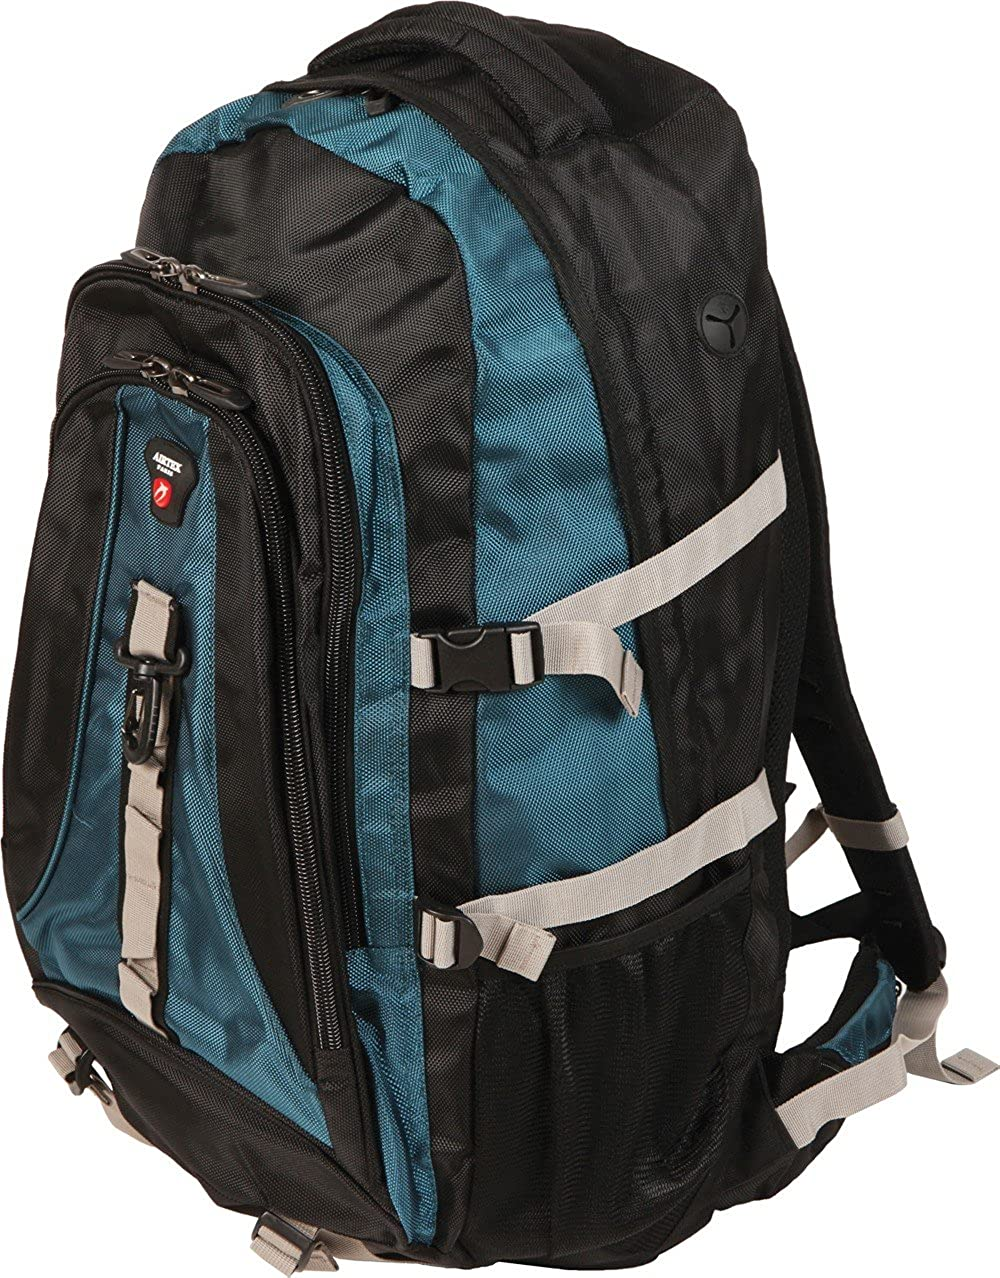 Airtex medium size hiking Backpack